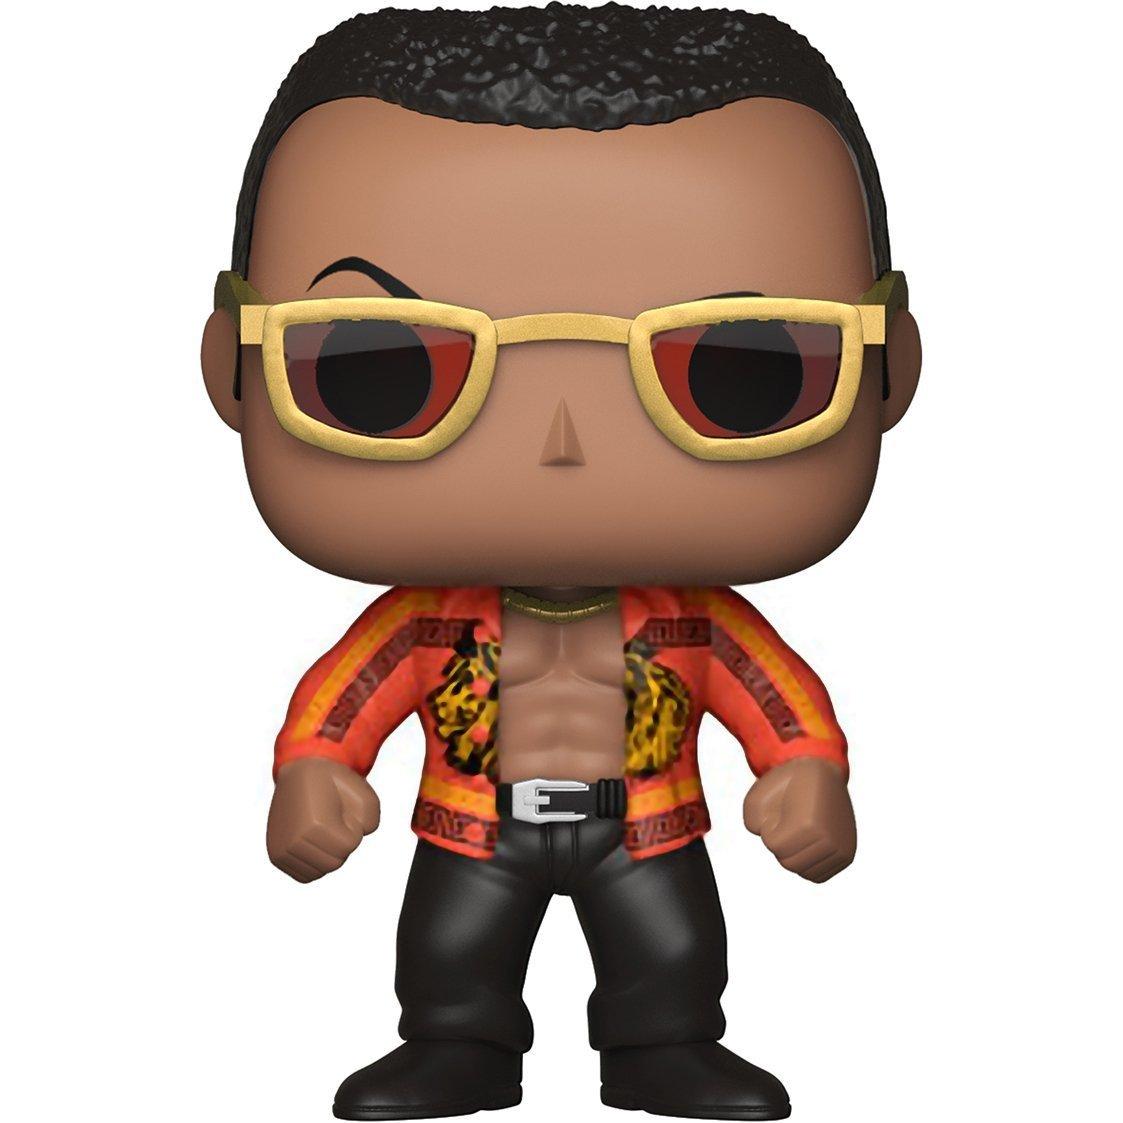 Bundled with Pop BOX PROTECTOR CASE Funko Pop WWE The Rock Old School Vinyl Figure